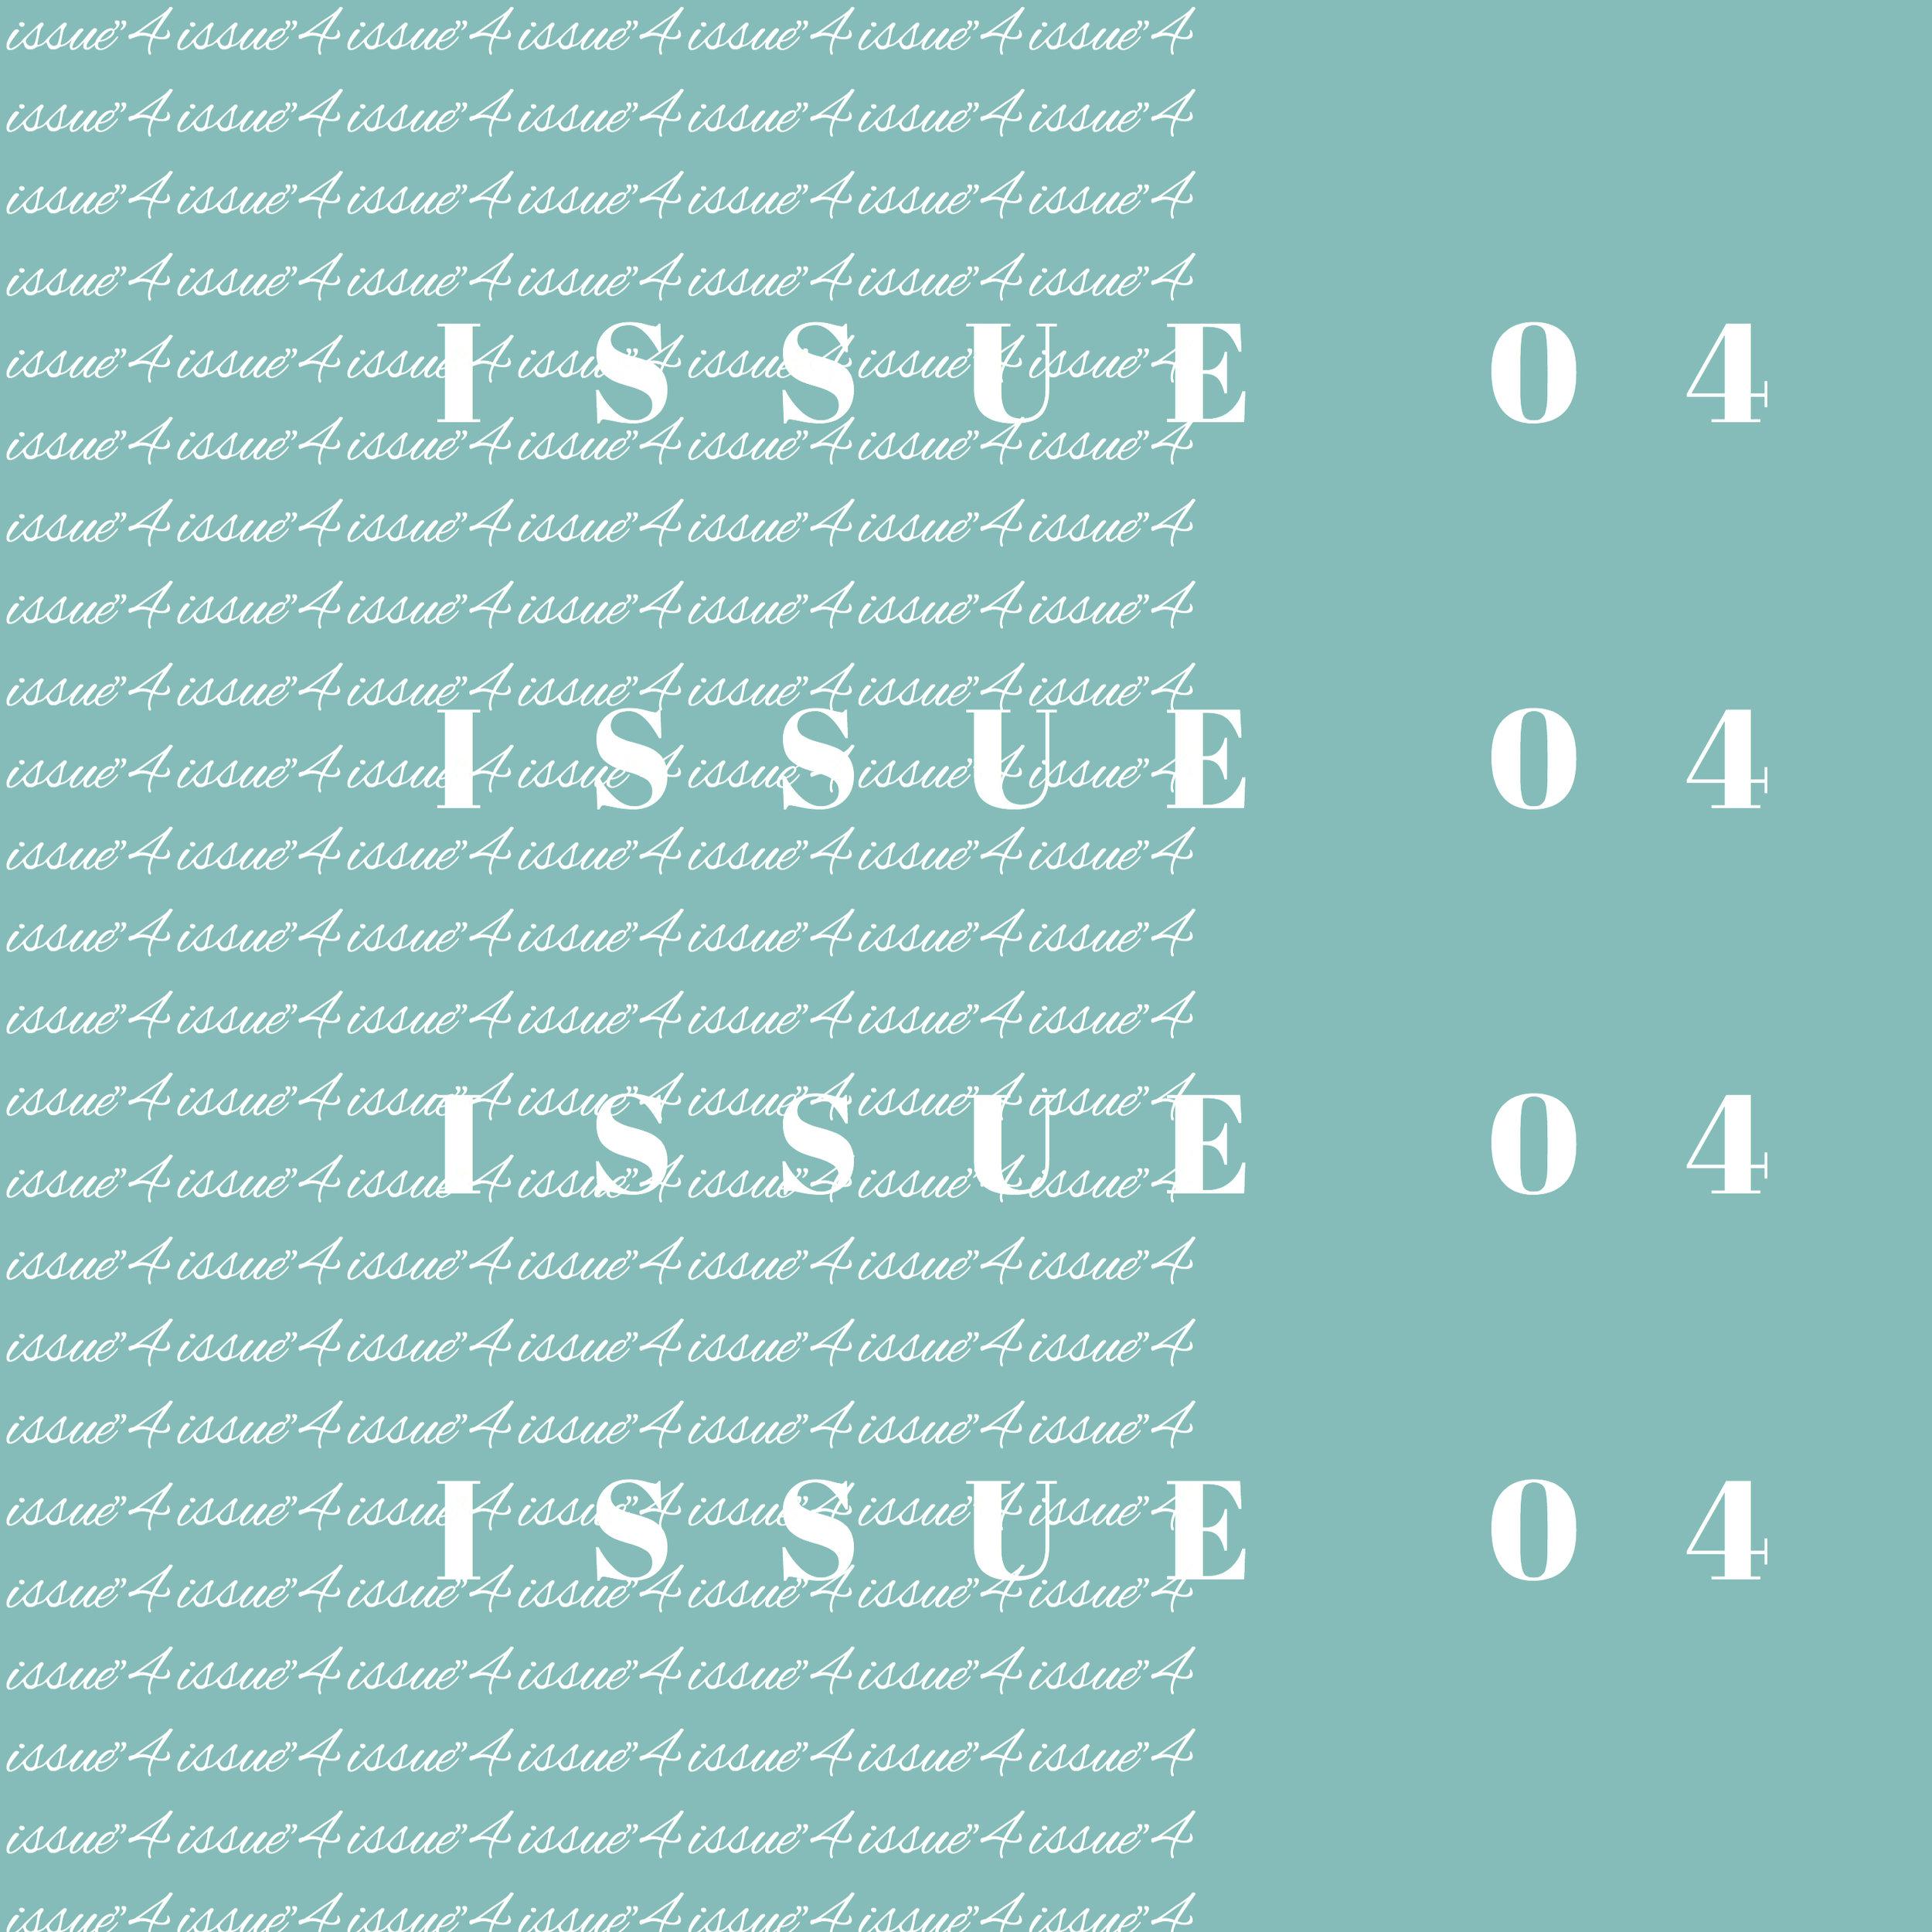 ISSUE04.JPG